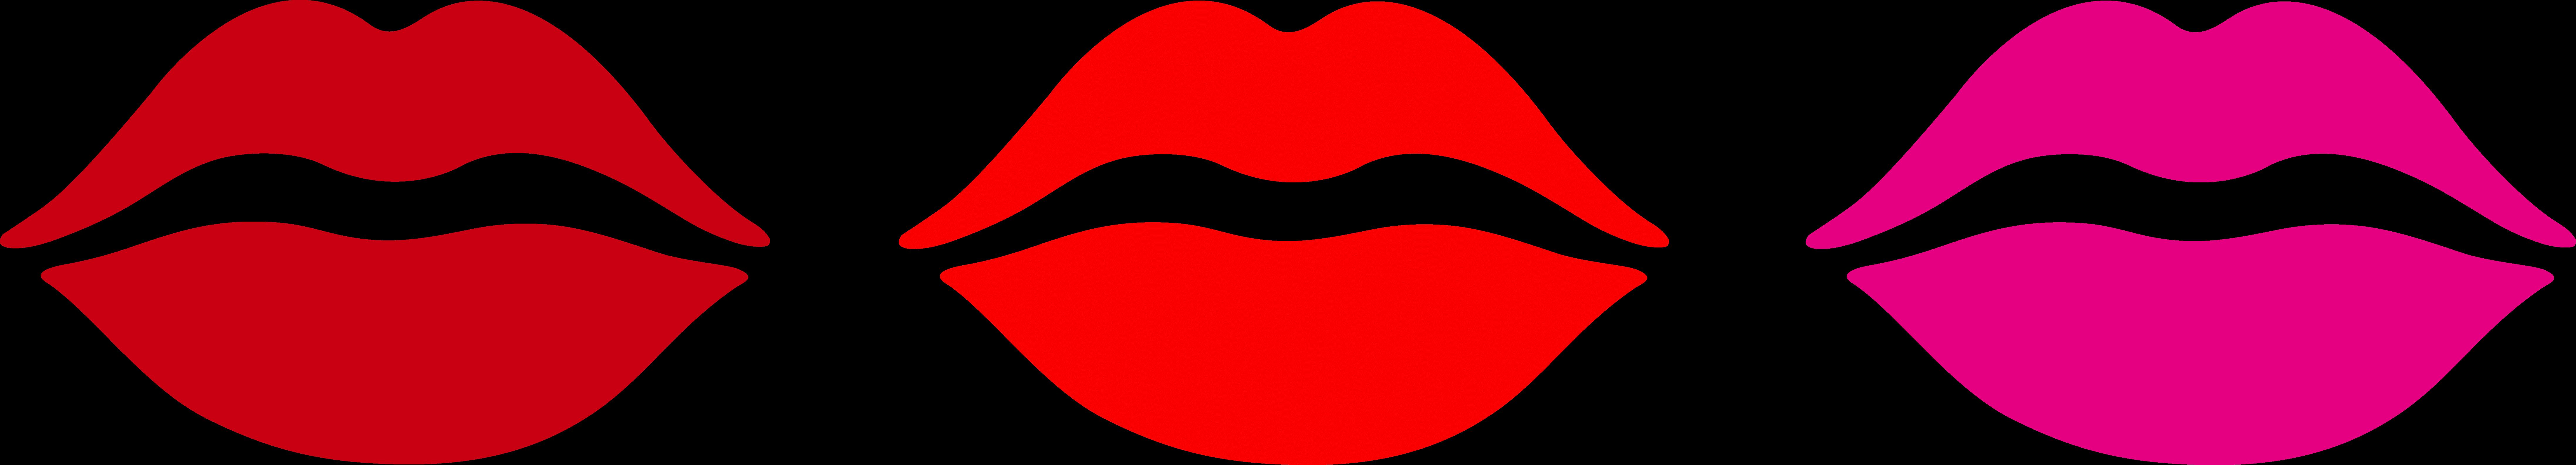 8778x1586 Kiss Cliparts